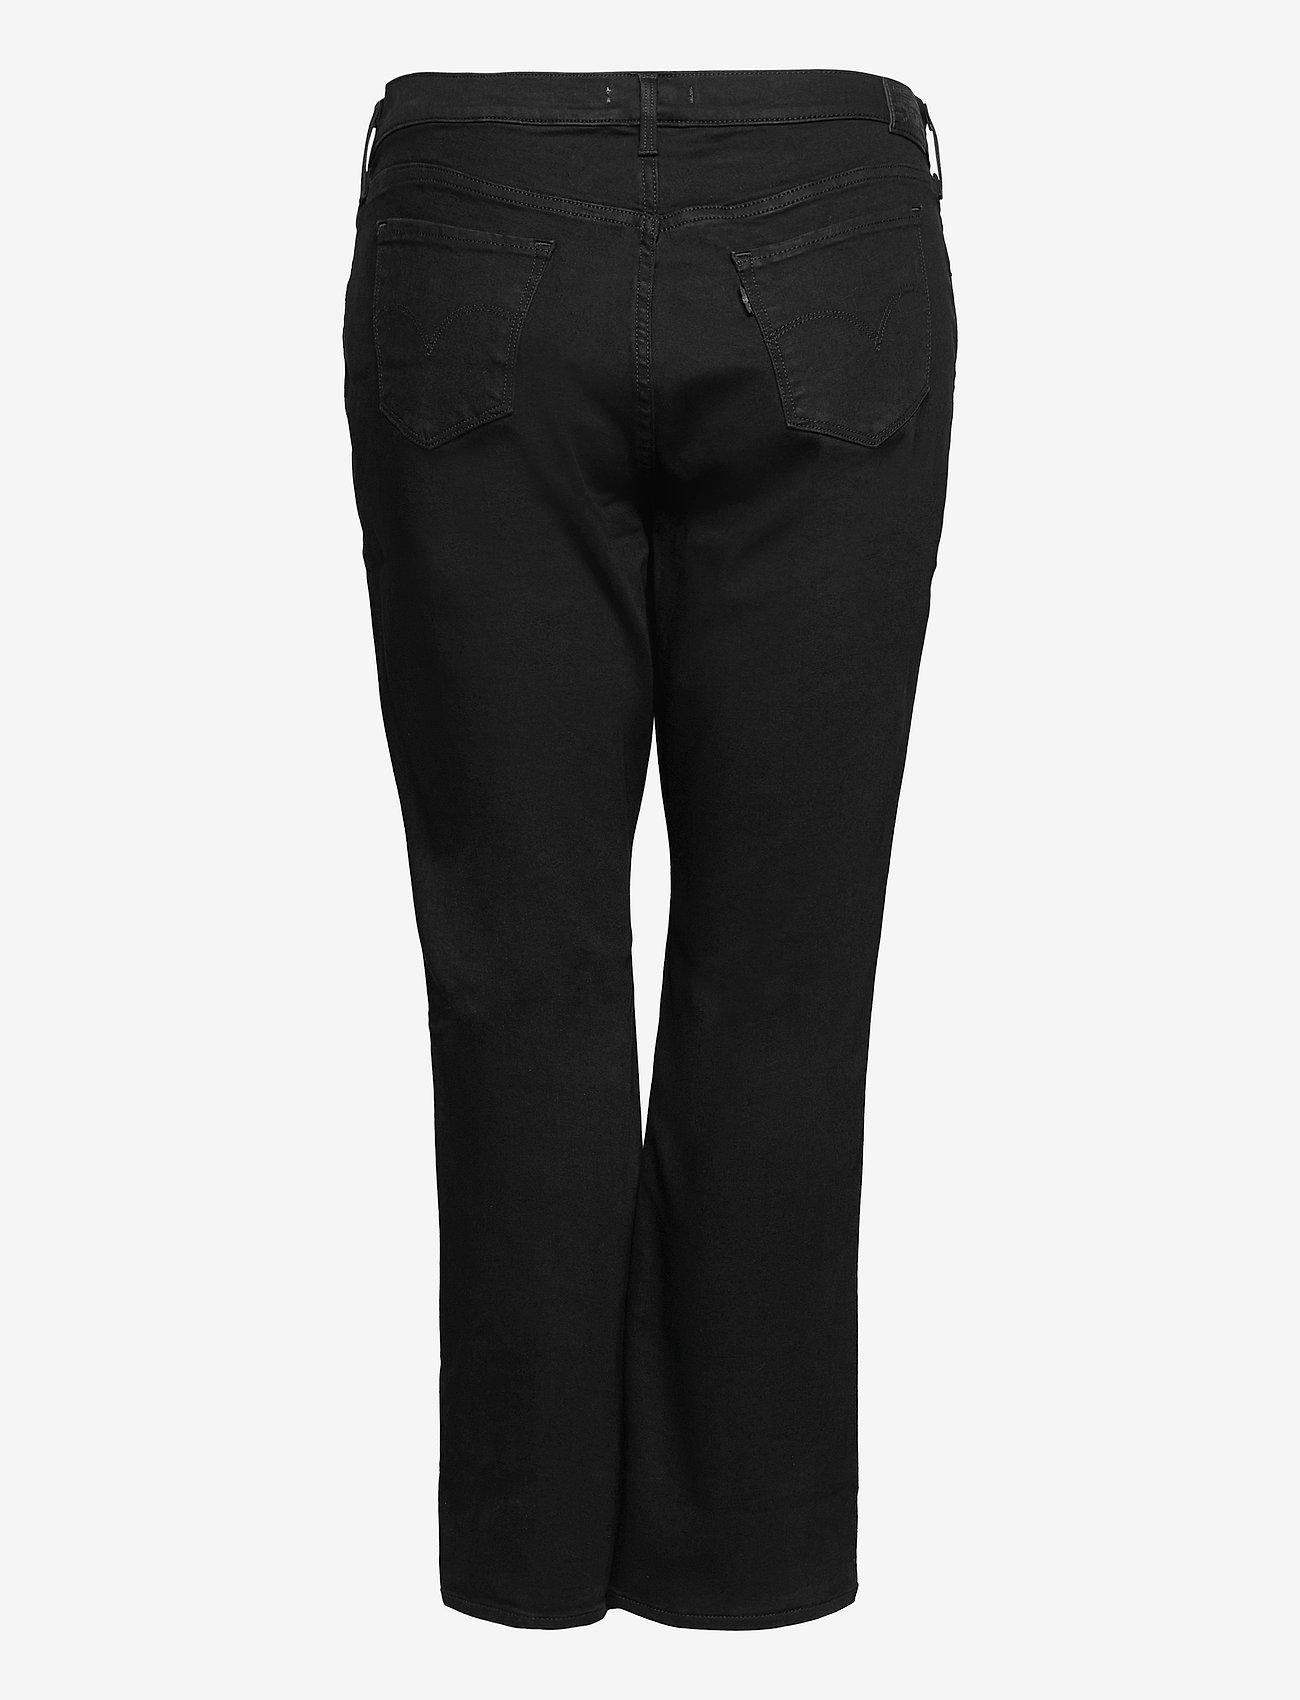 Levi's Plus Size - 314 PL SHAPING STRAIGHT 4X STR - straight jeans - blacks - 1